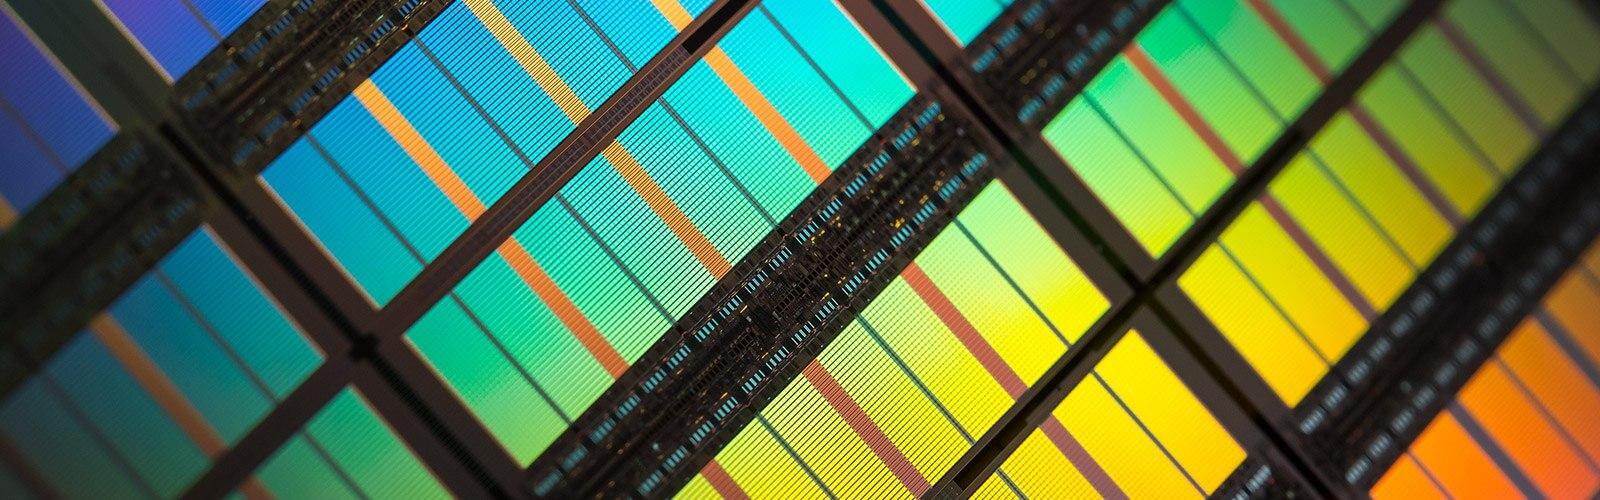 Next-Gen Mobile Memory Liberates 5G/AI Innovation